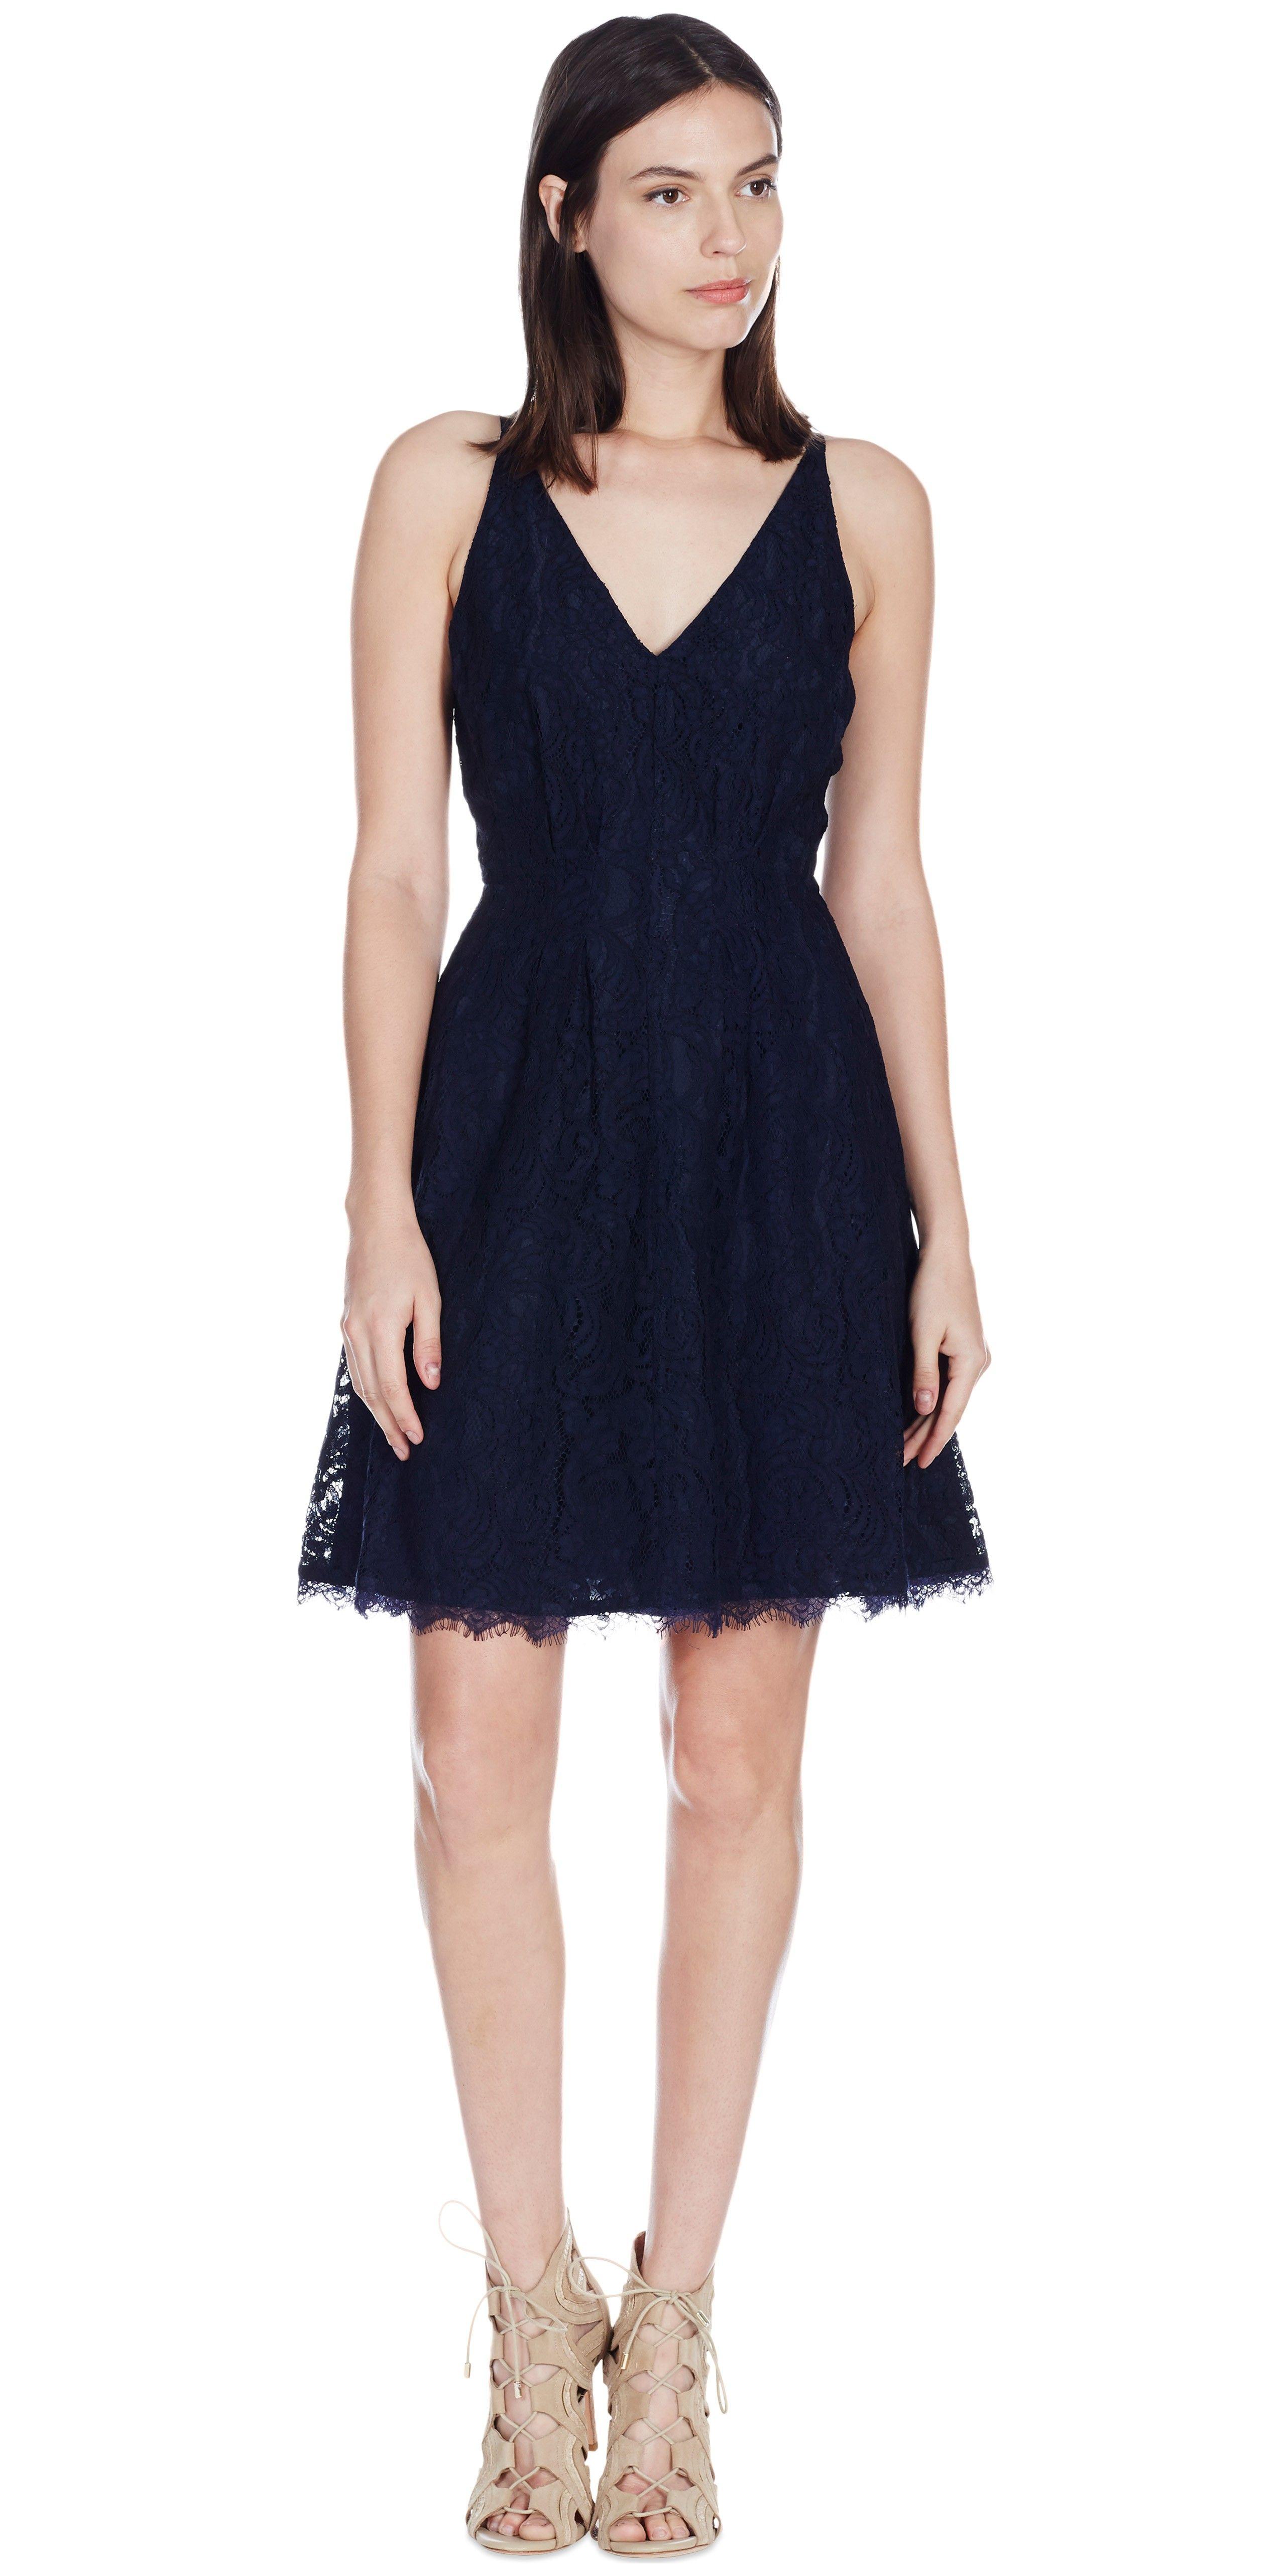 Loret dress clothing pinterest joie handbag accessories and